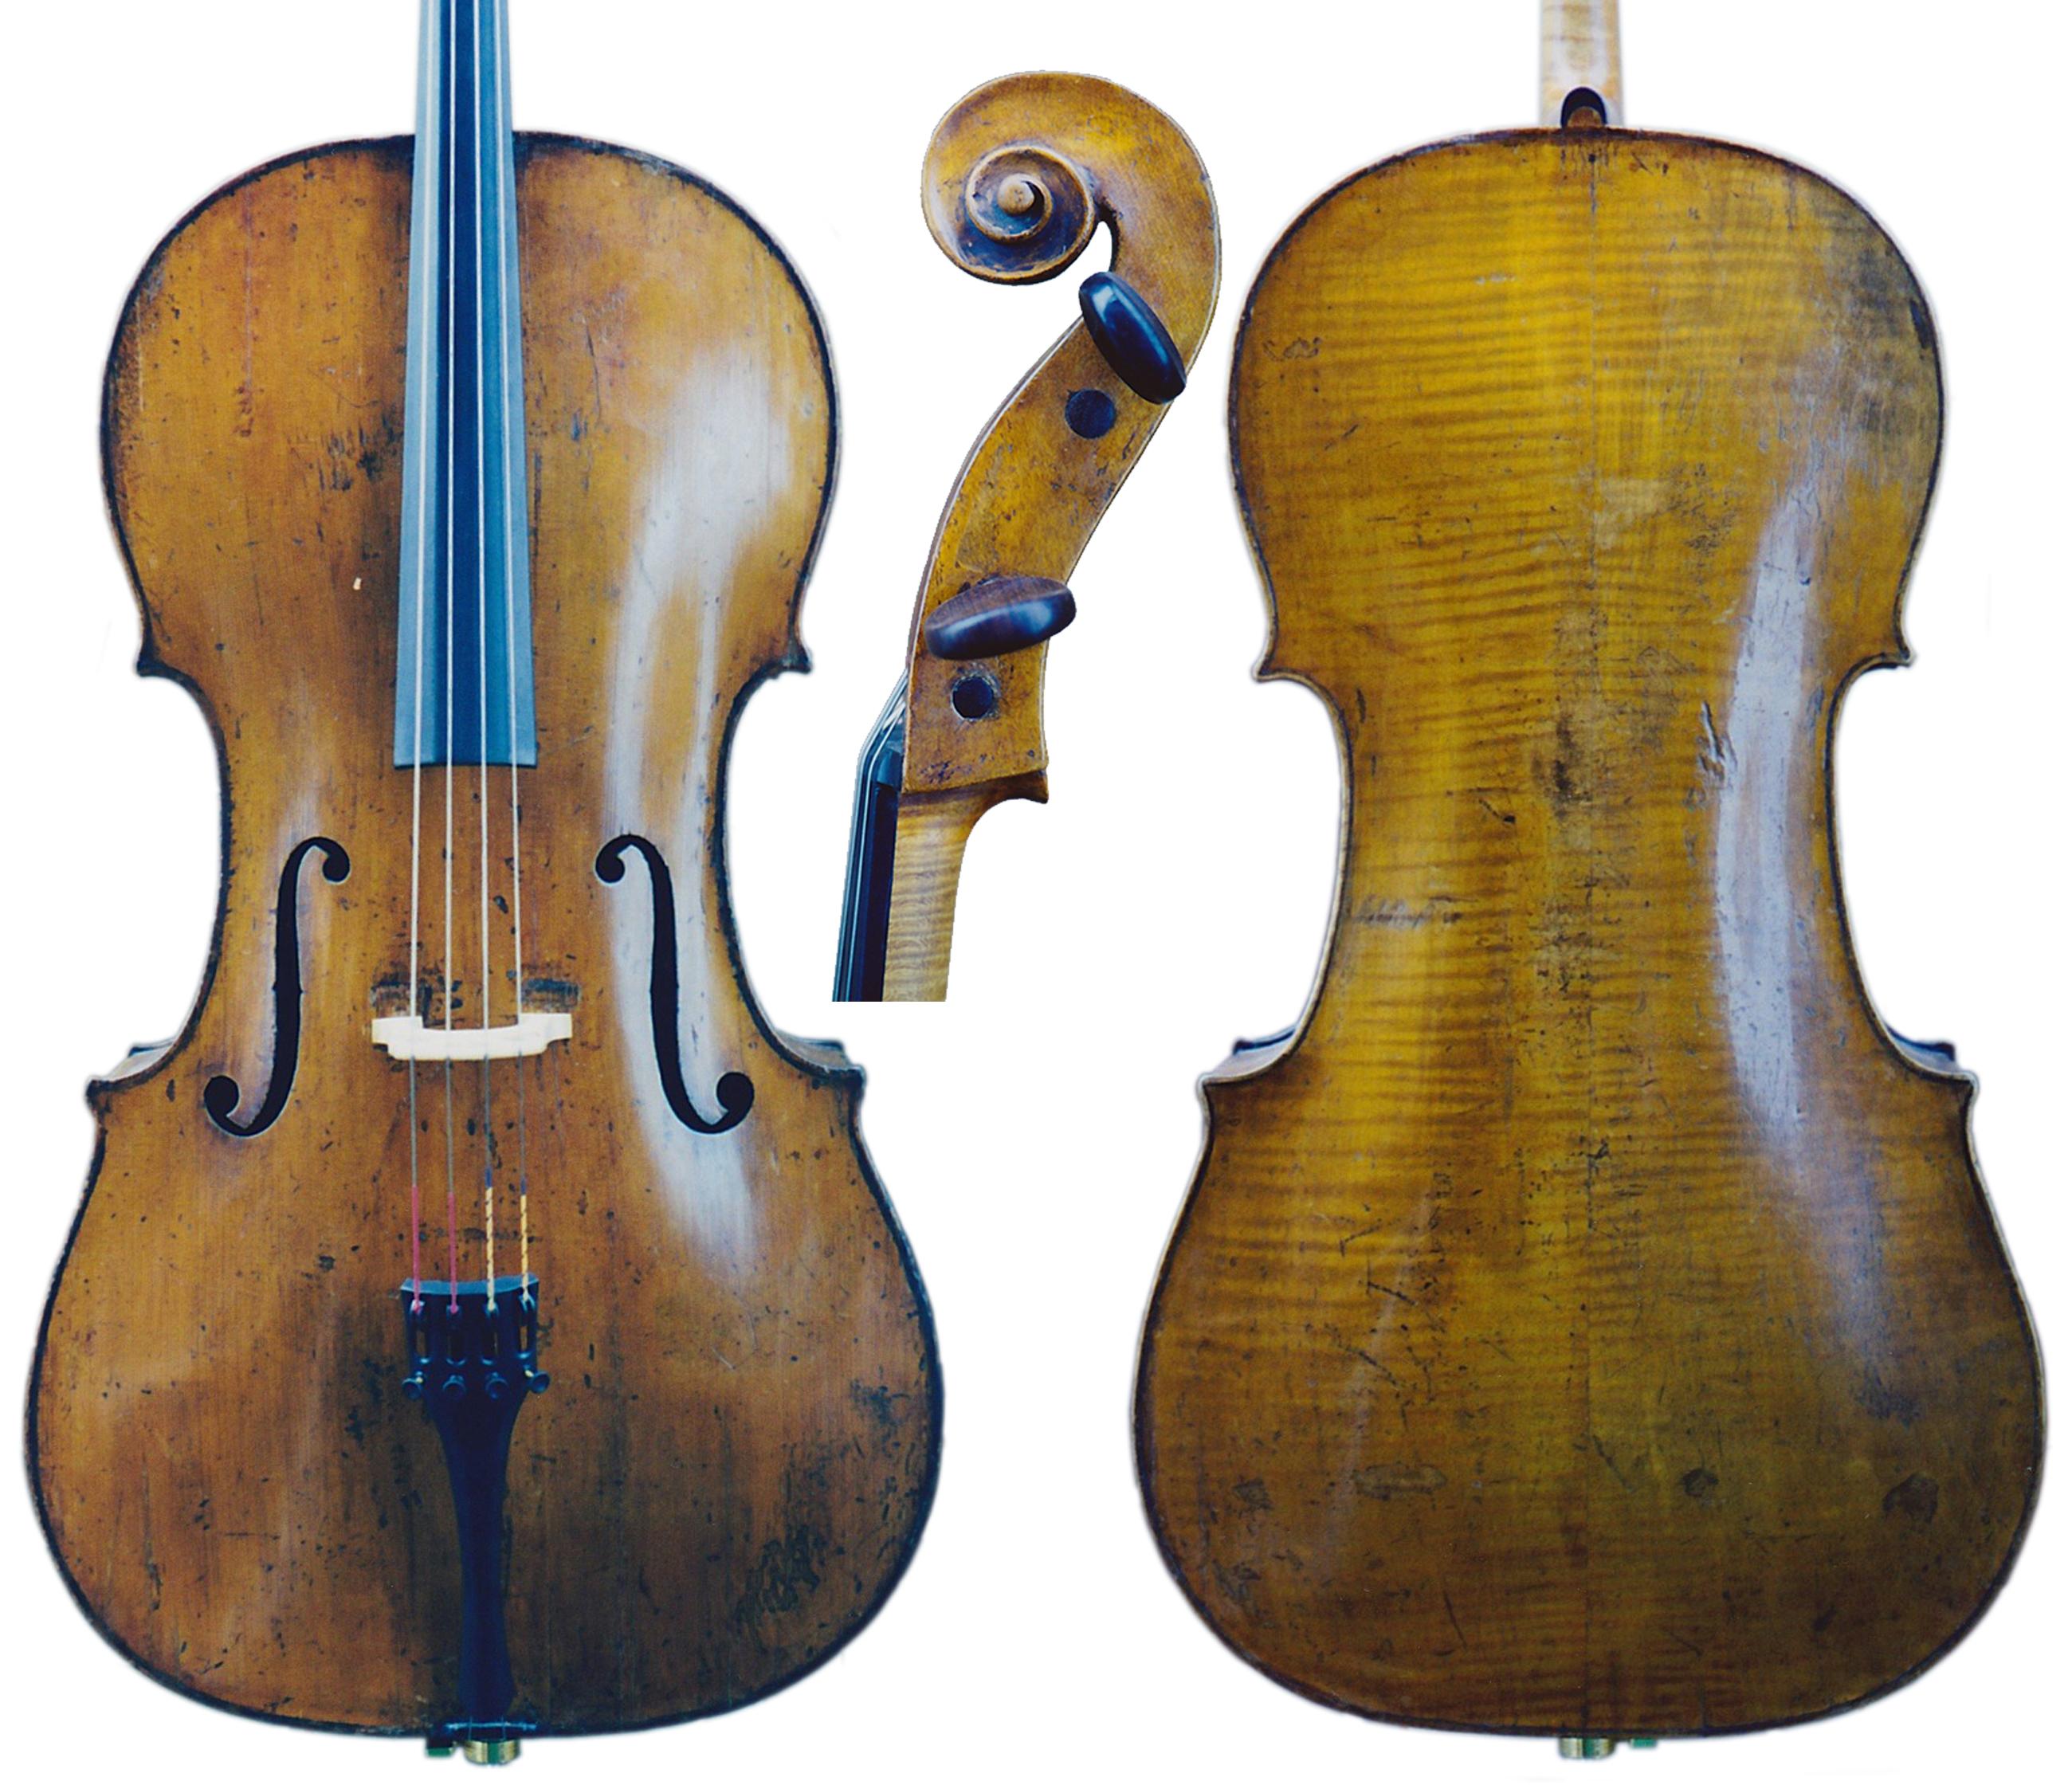 A Violin by Joseph Gagliano, Naples - Bishop Instruments & Bows